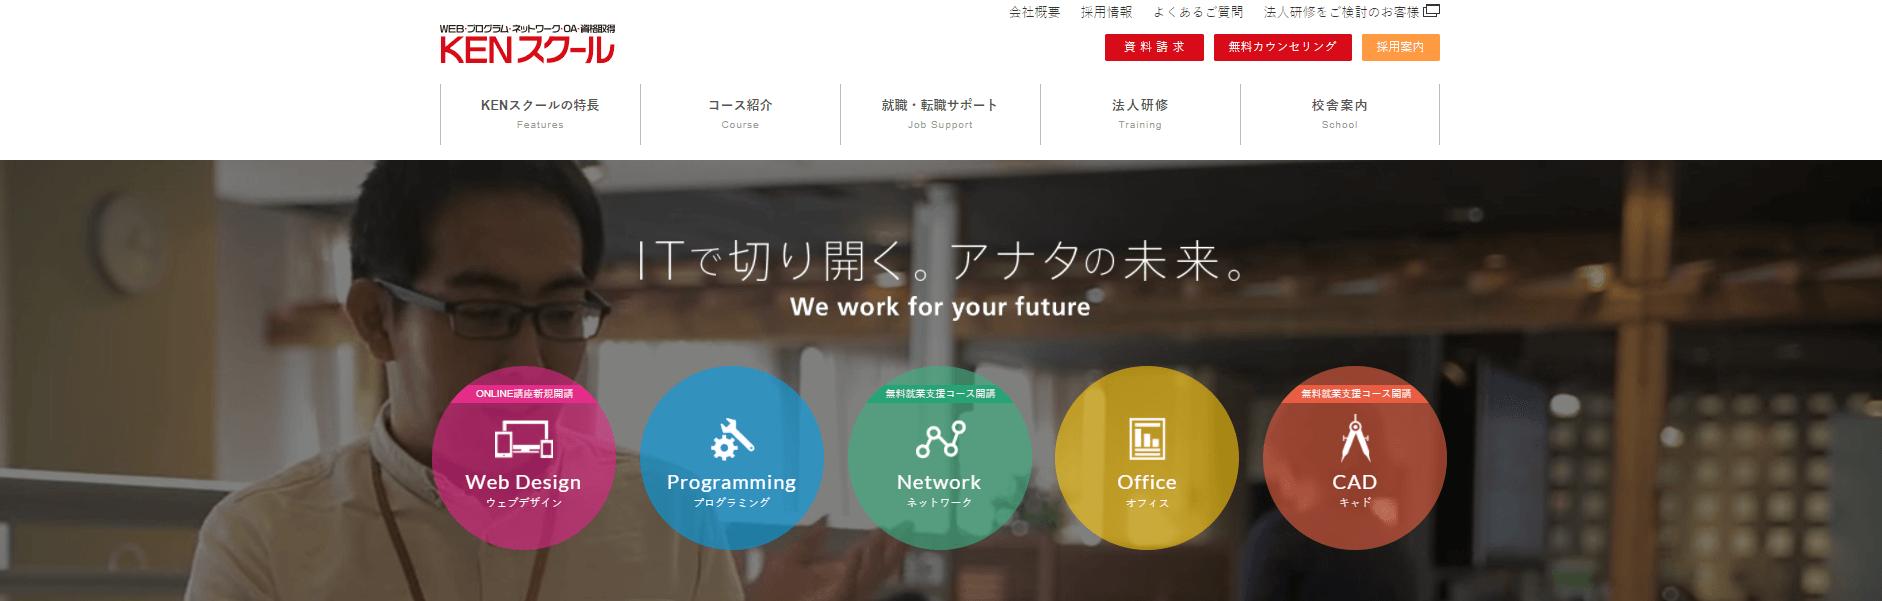 webデザイン_スクール_転職サポートが強い_kenスクール